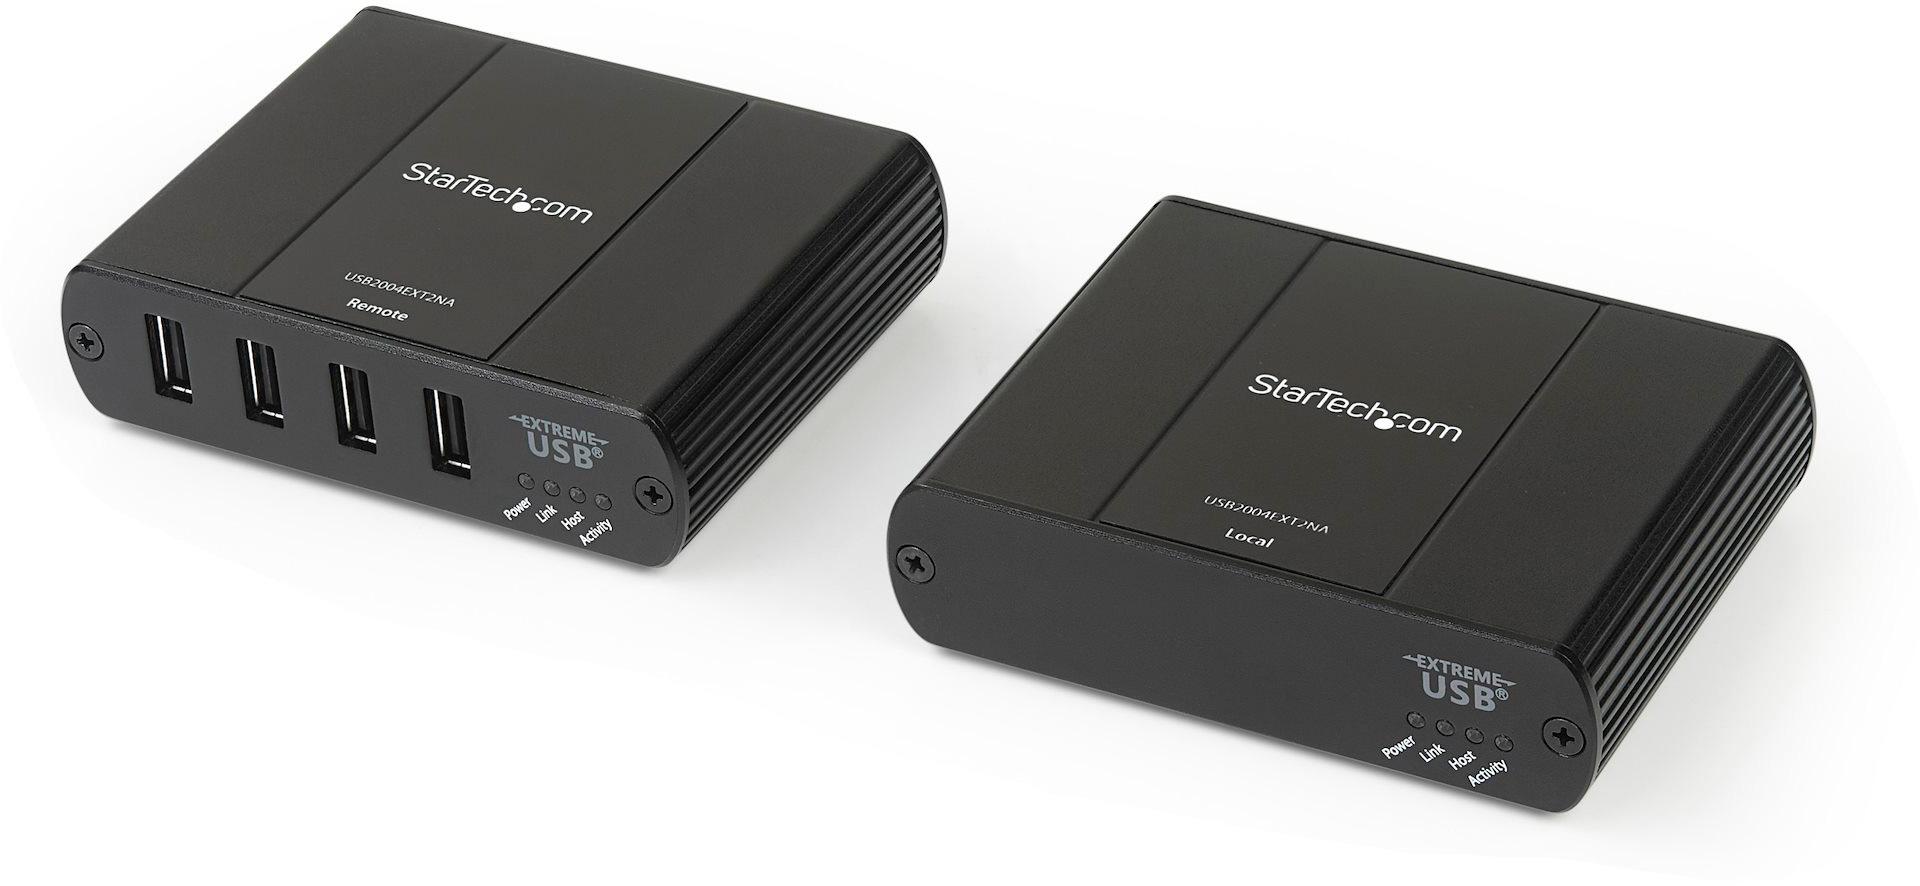 StarTech USB2004EXT2NA 4 Port USB 2.0 Extender Hub over Cat5e/Cat6 ST-USB2004EXT2NA